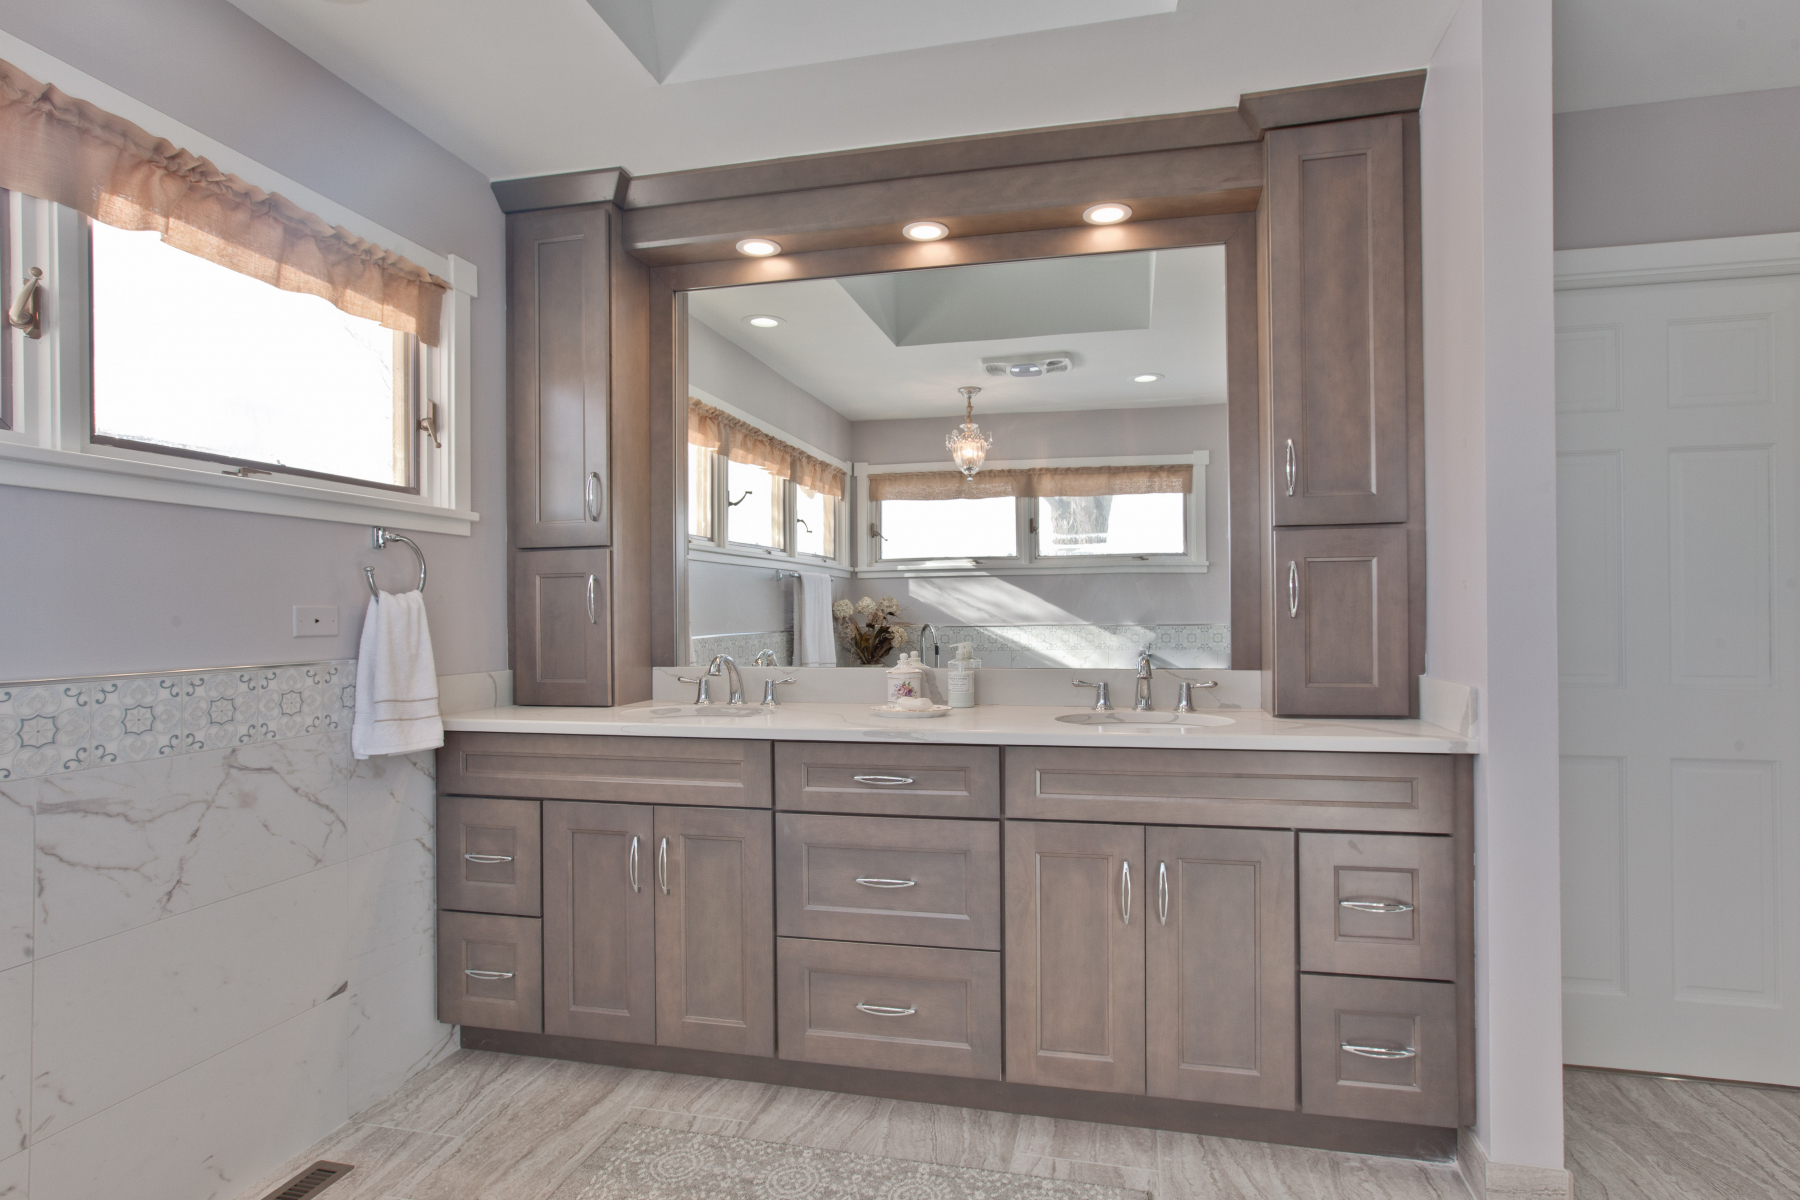 Maria Y Riverwoods Bathroom after 1